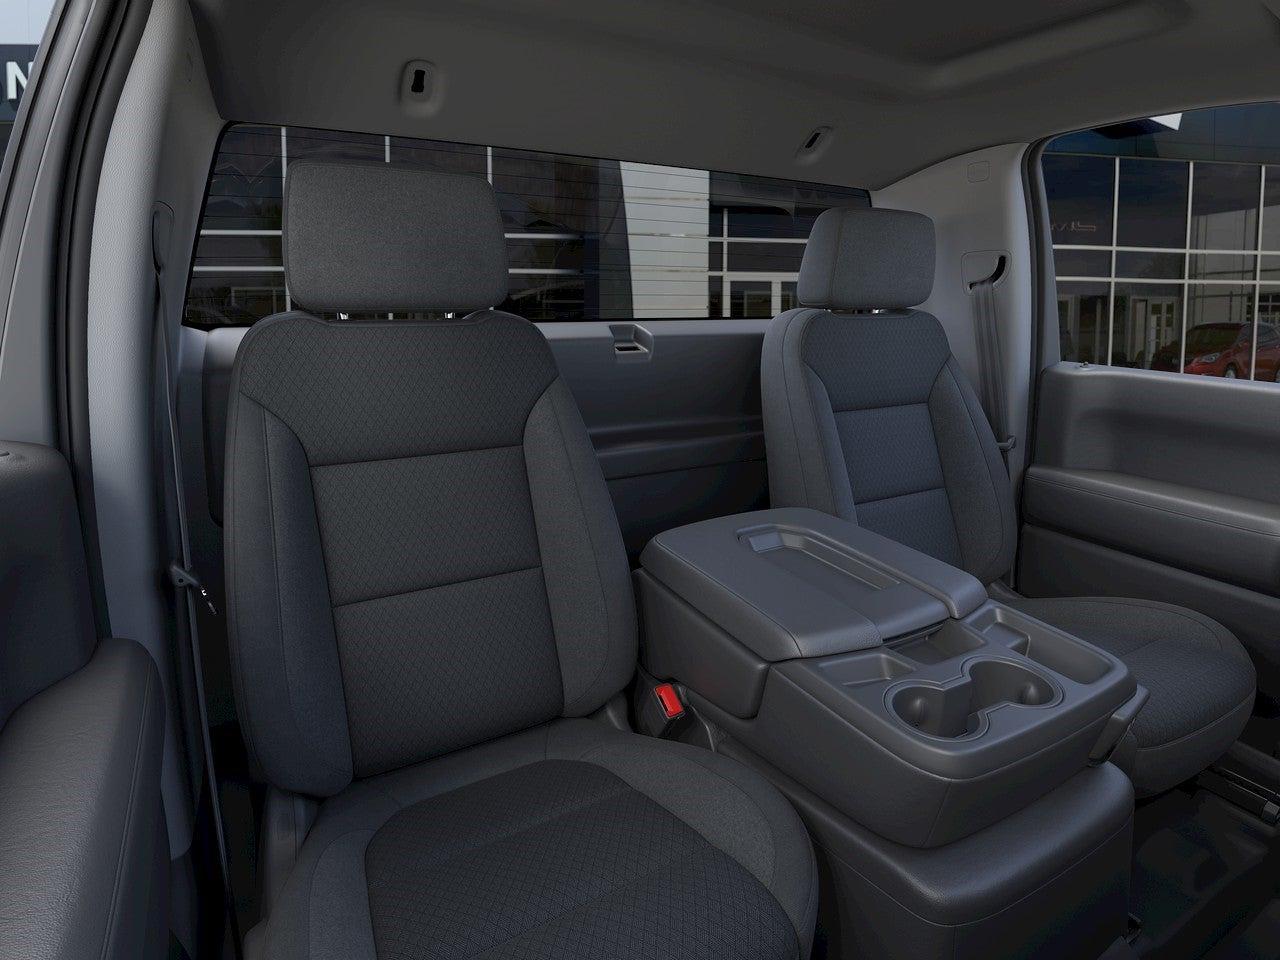 2021 GMC Sierra 1500 Regular Cab 4x4, Pickup #V21207 - photo 33